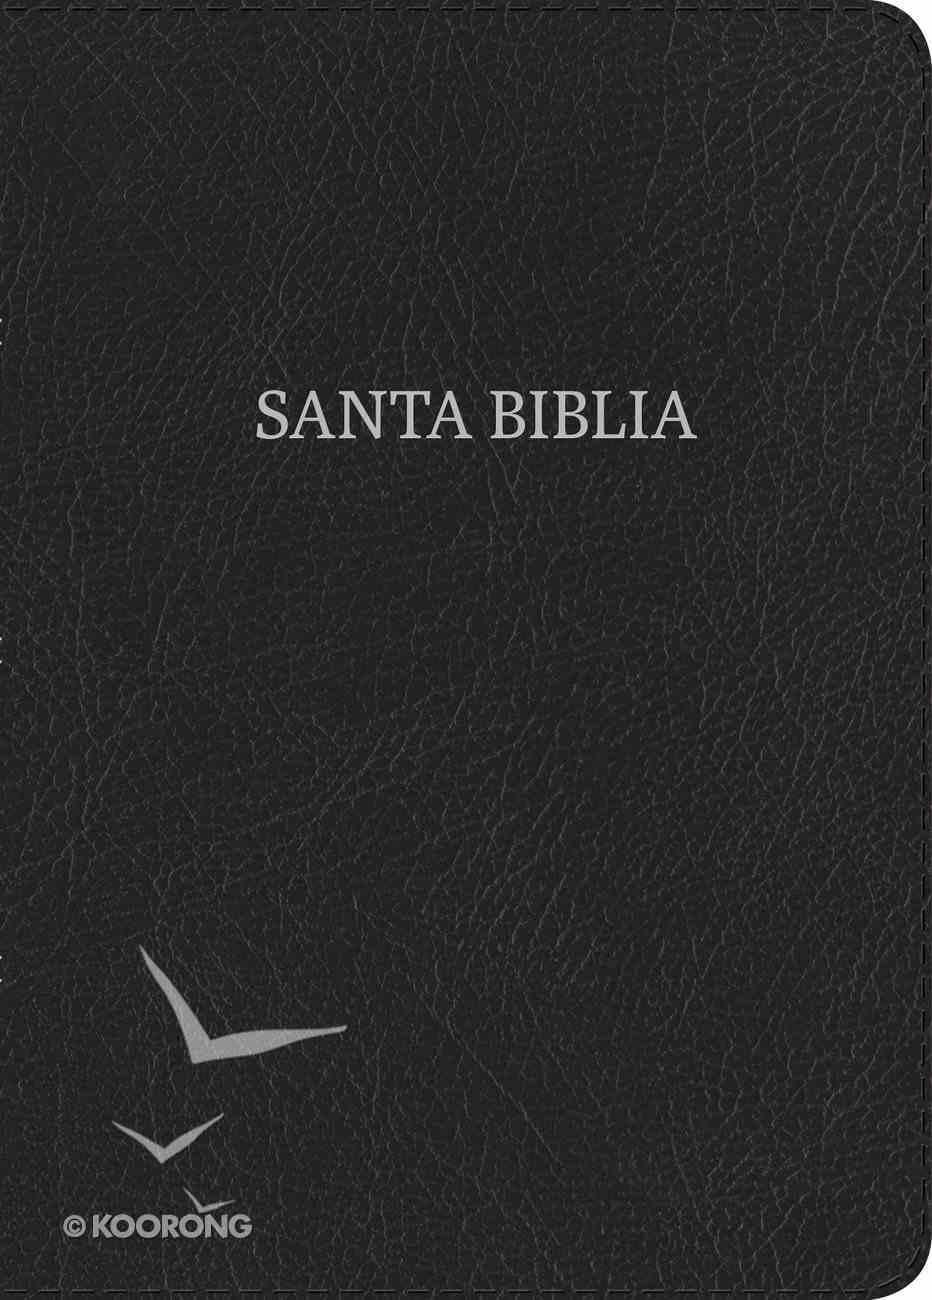 Nvi Biblia Letra Super Gigante Negro (Super Giant Print) Bonded Leather